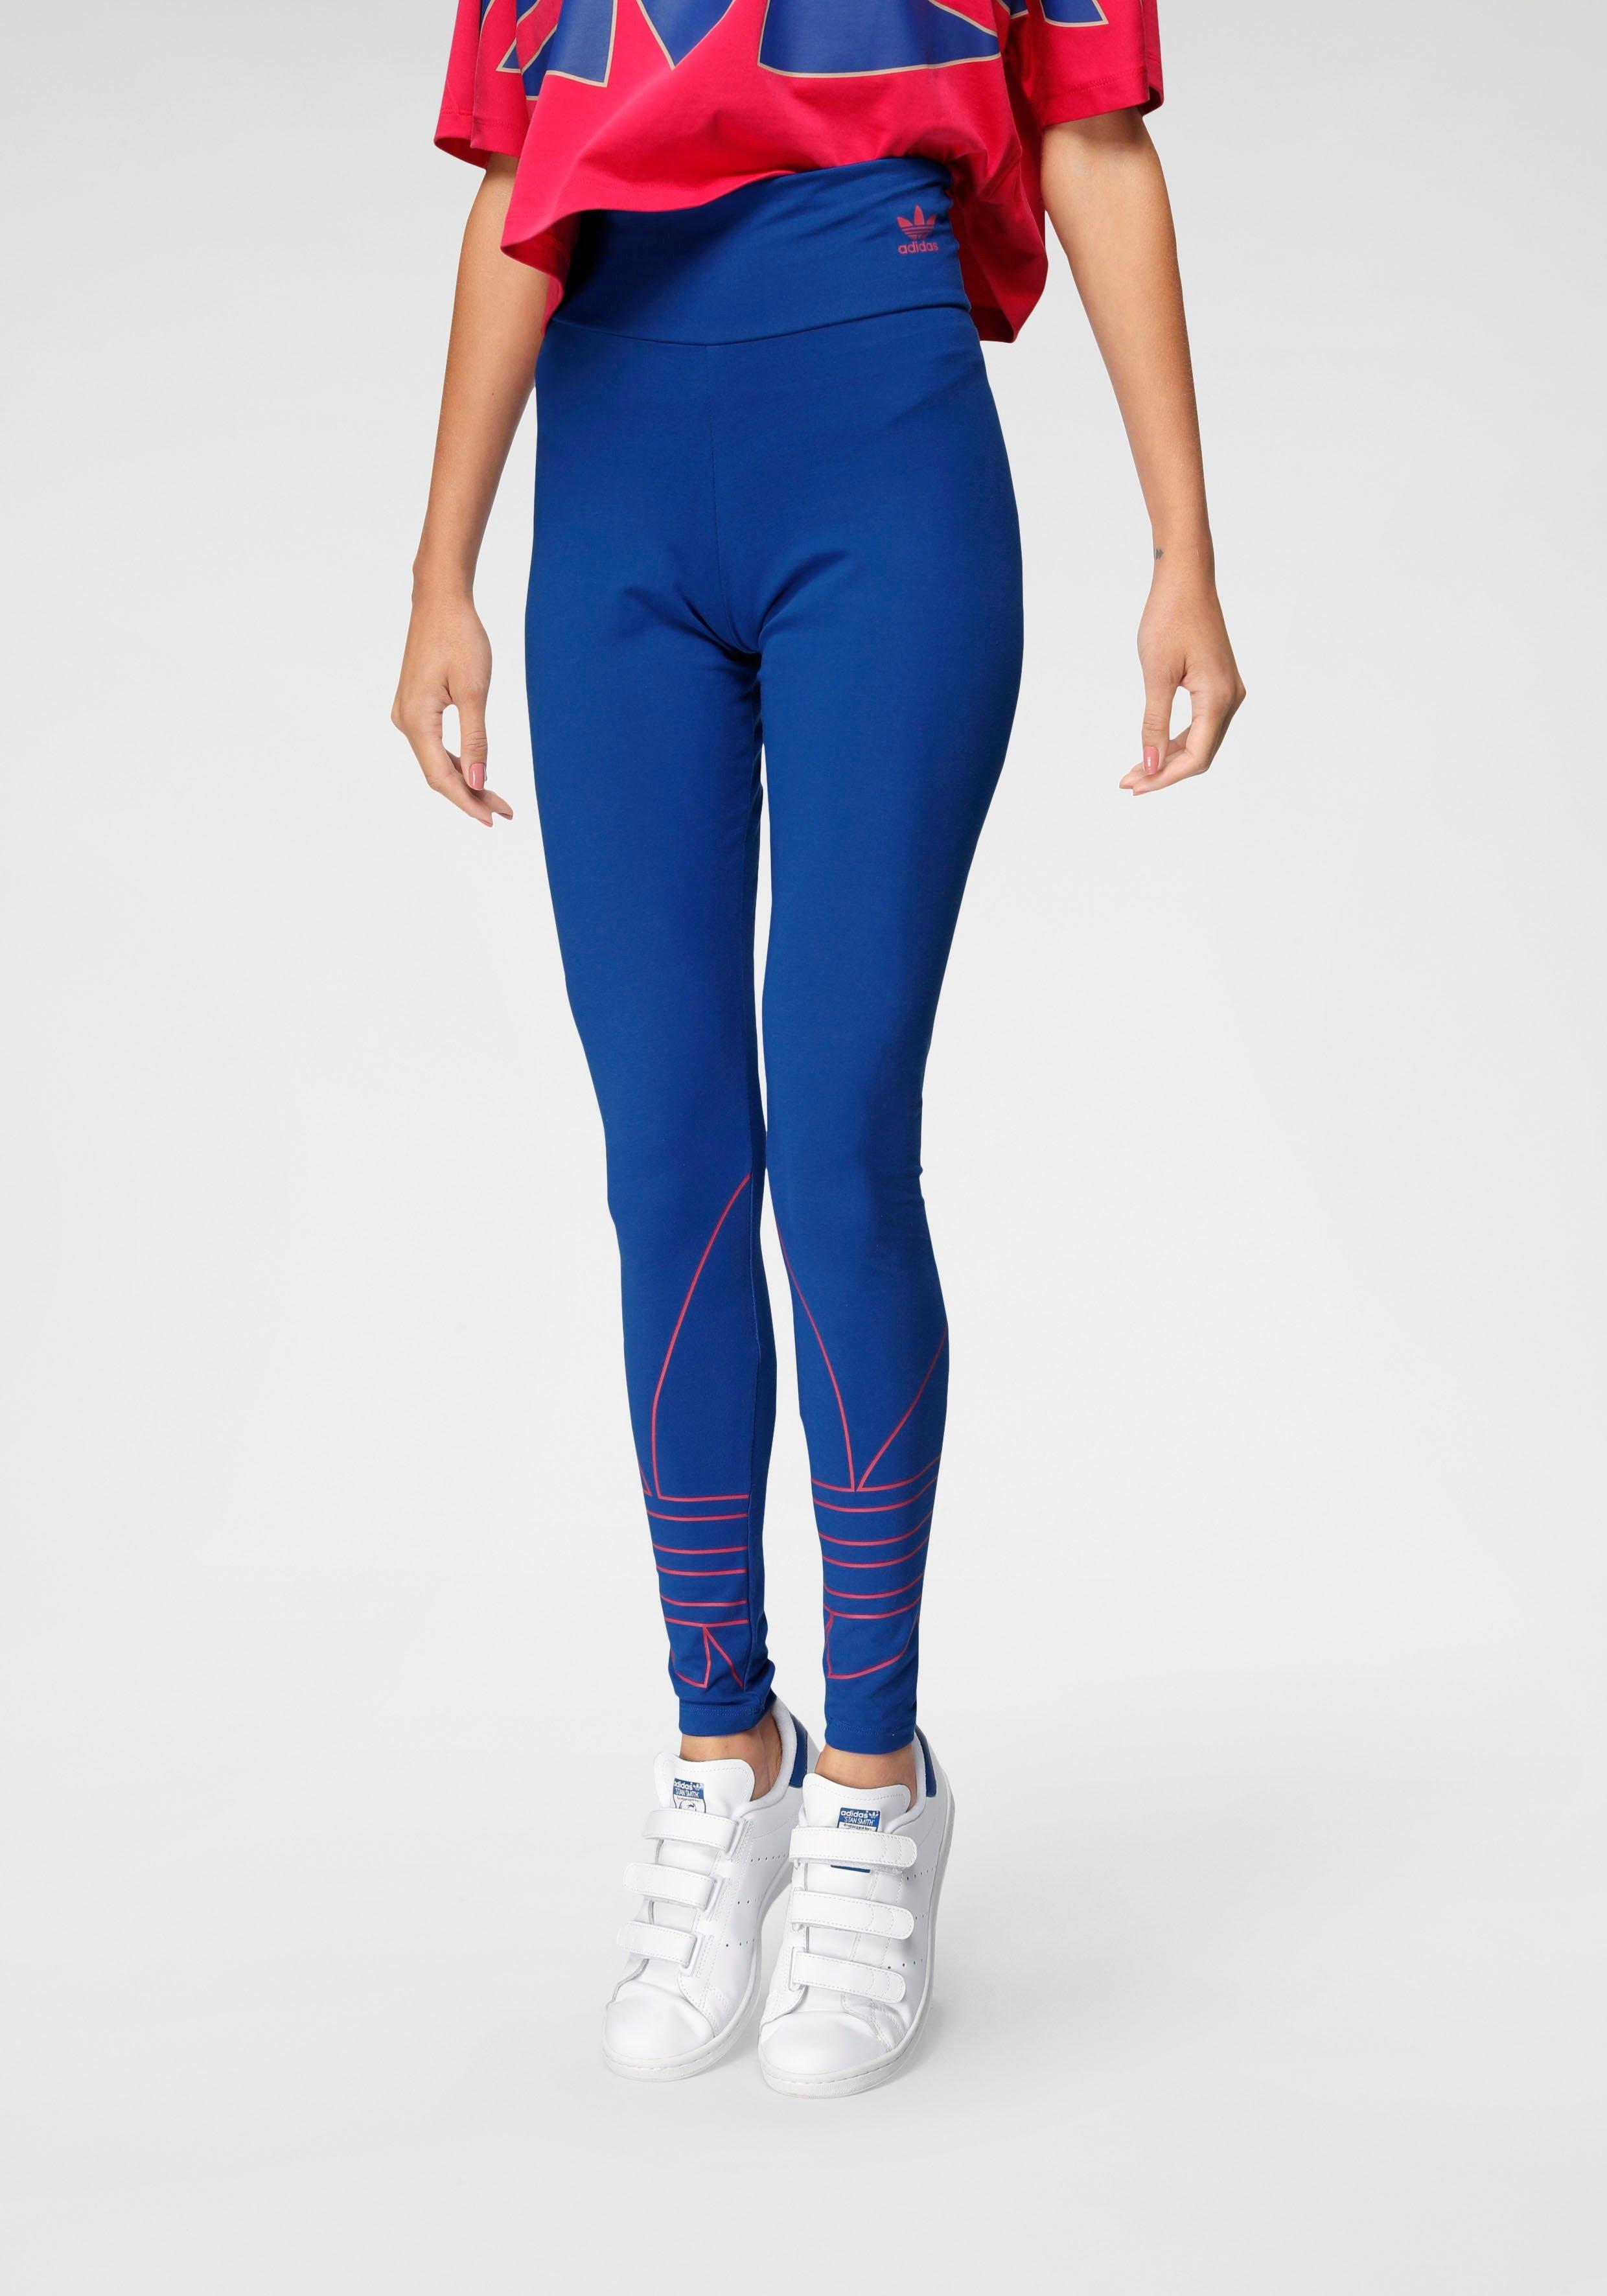 adidas Originals legging »LARGE LOGO TIGHTS« bij OTTO online kopen